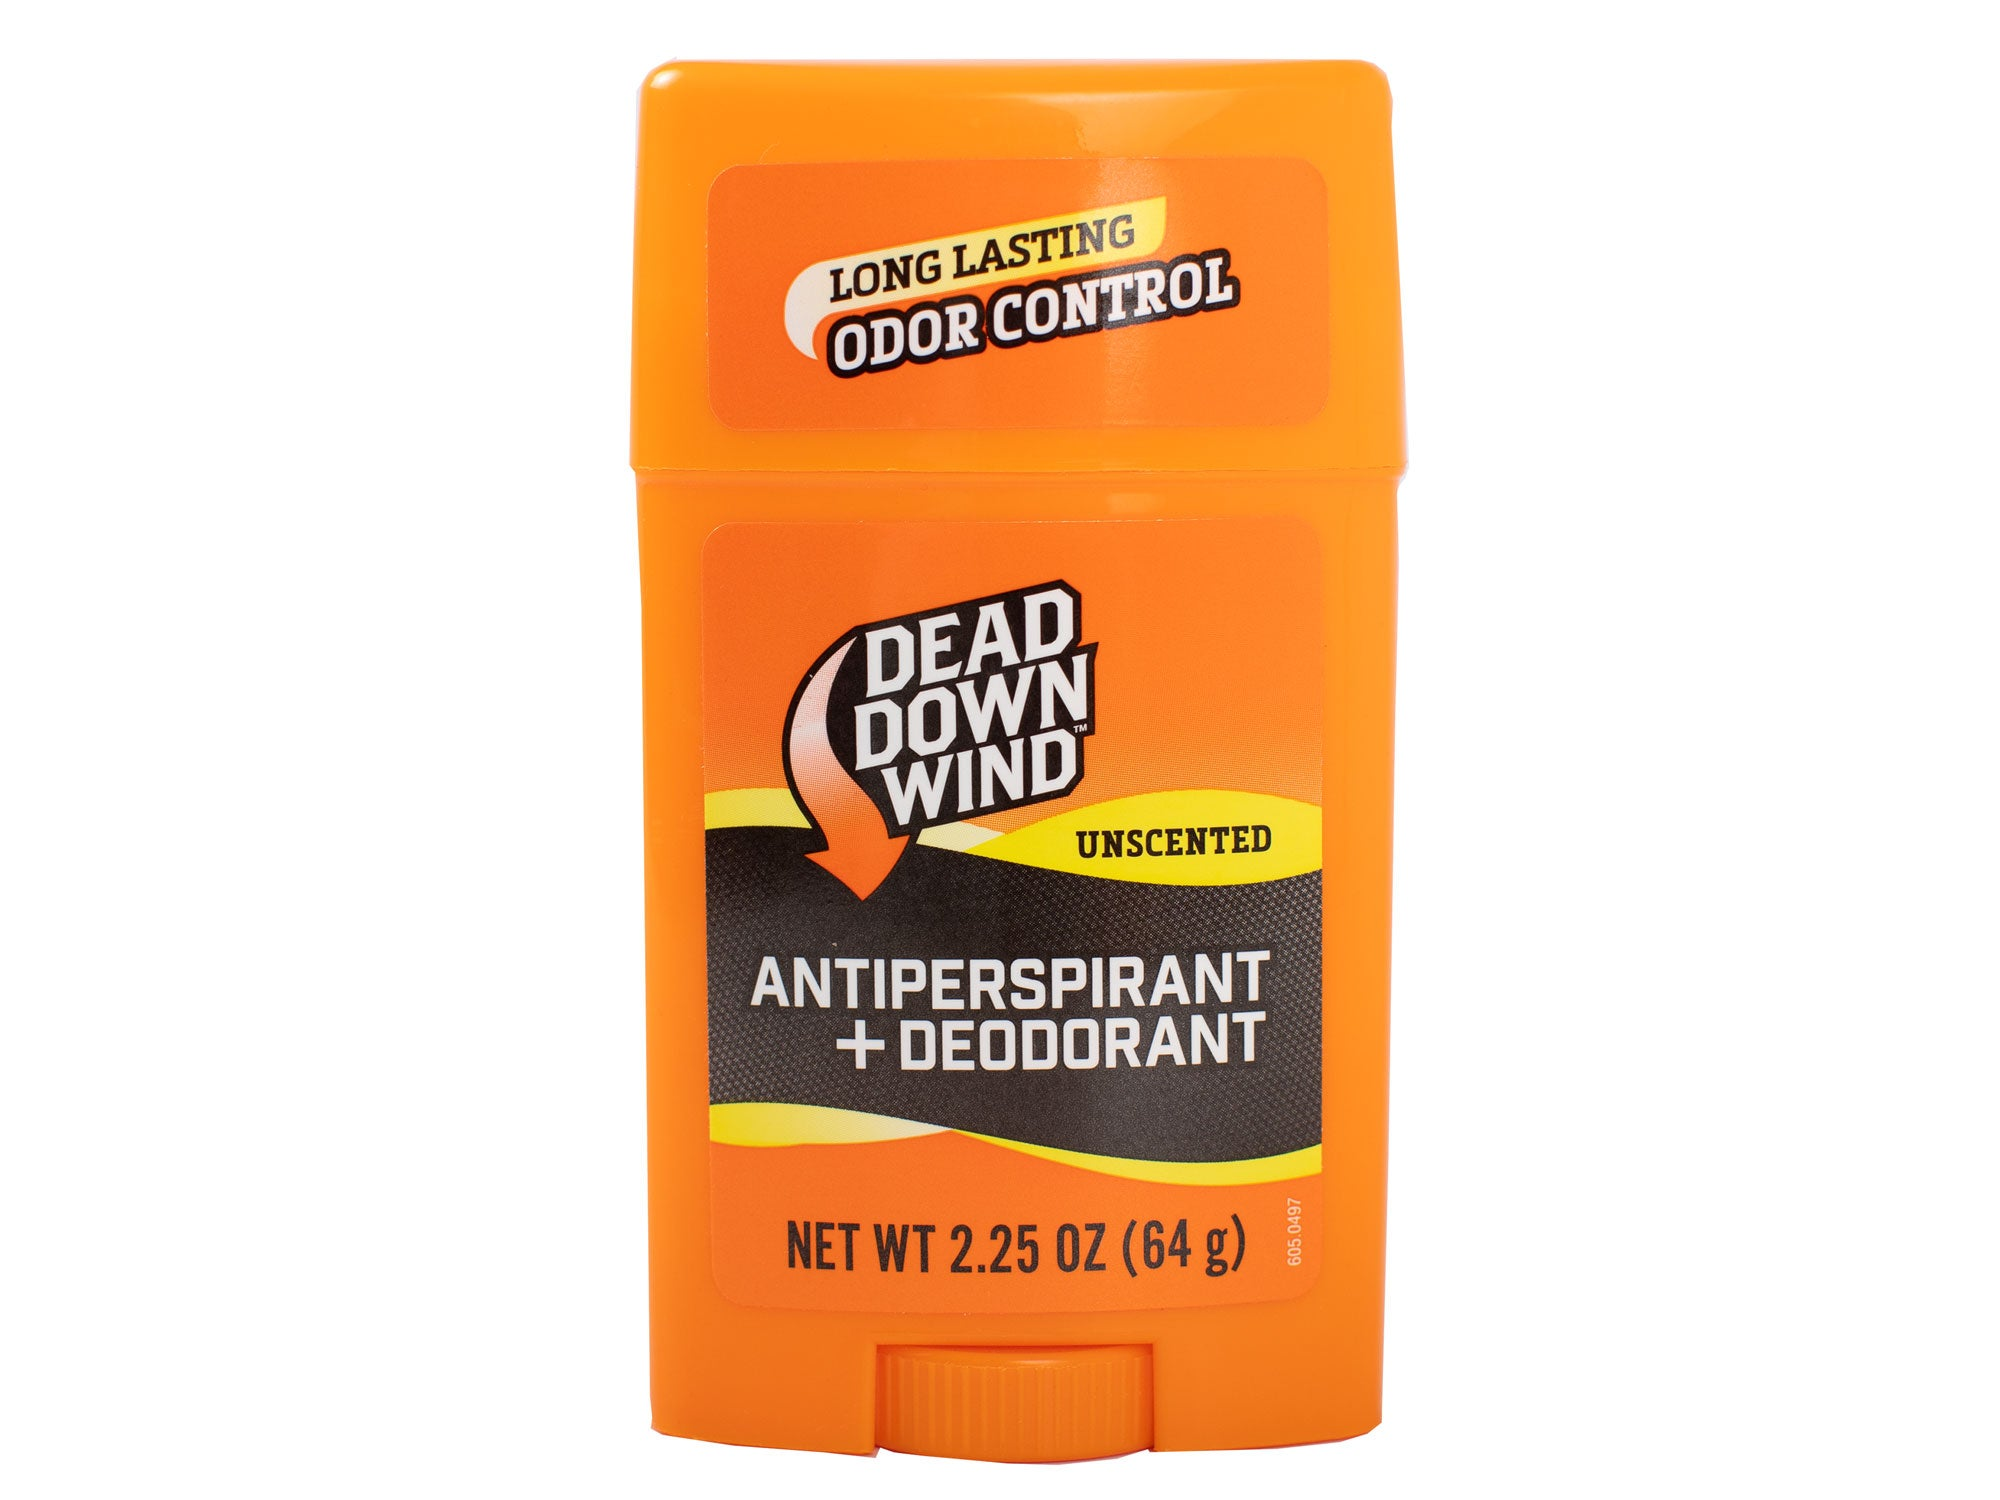 Dead Down Wind deodorant/antiperspirant